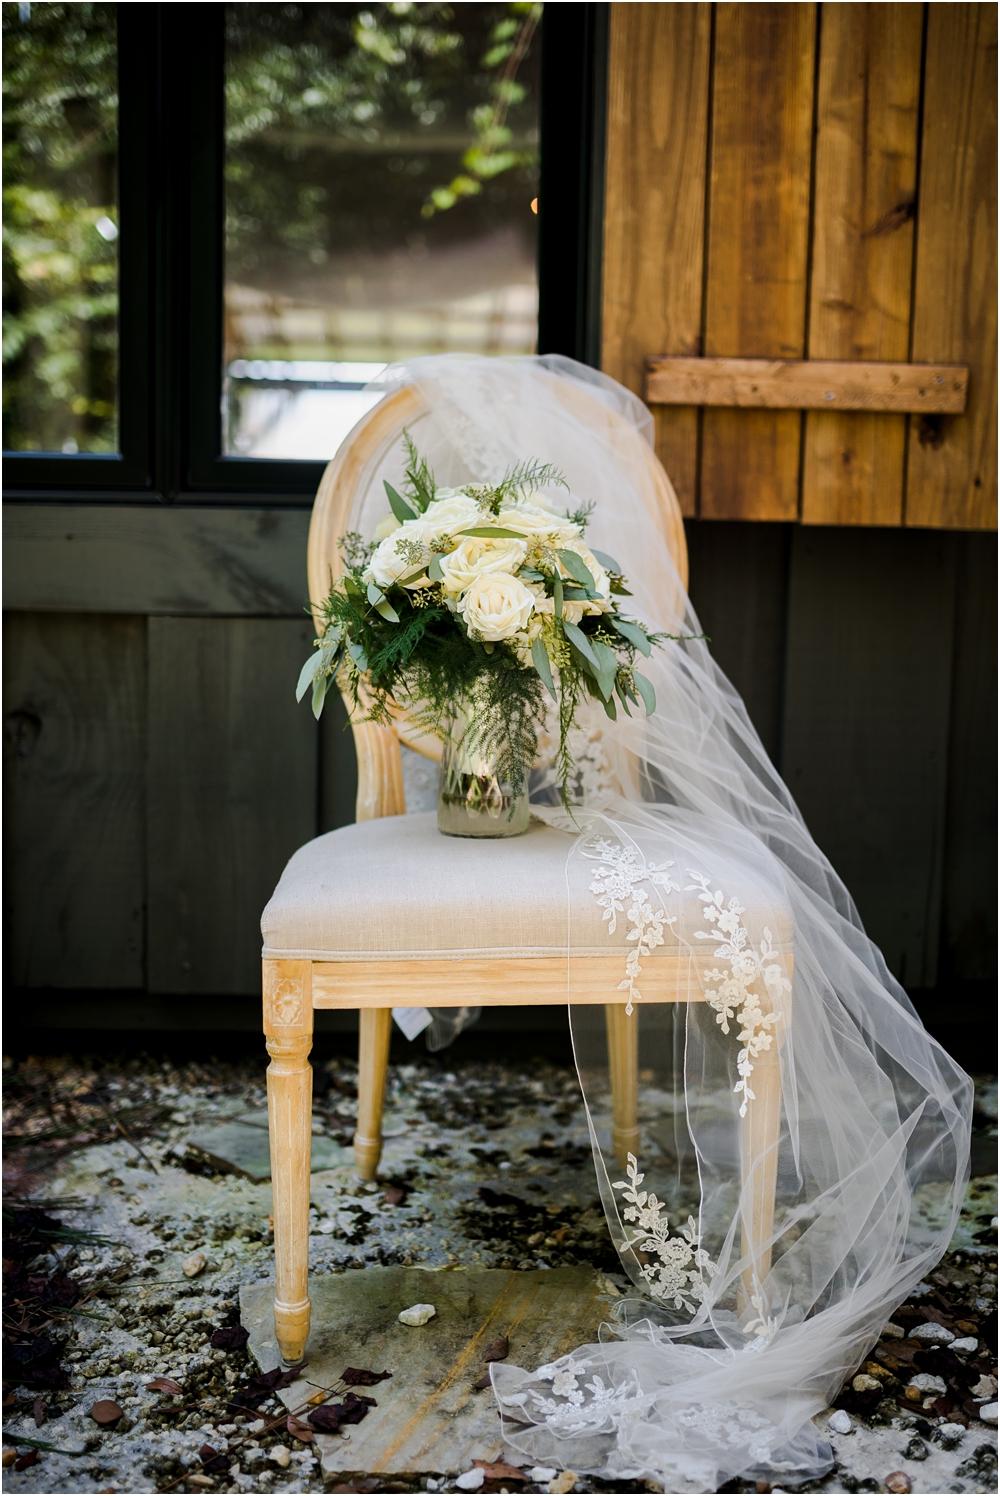 matthew-wedding-kiersten-stevenson-photography-30a-panama-city-beach-dothan-tallahassee-(10-of-579).JPG